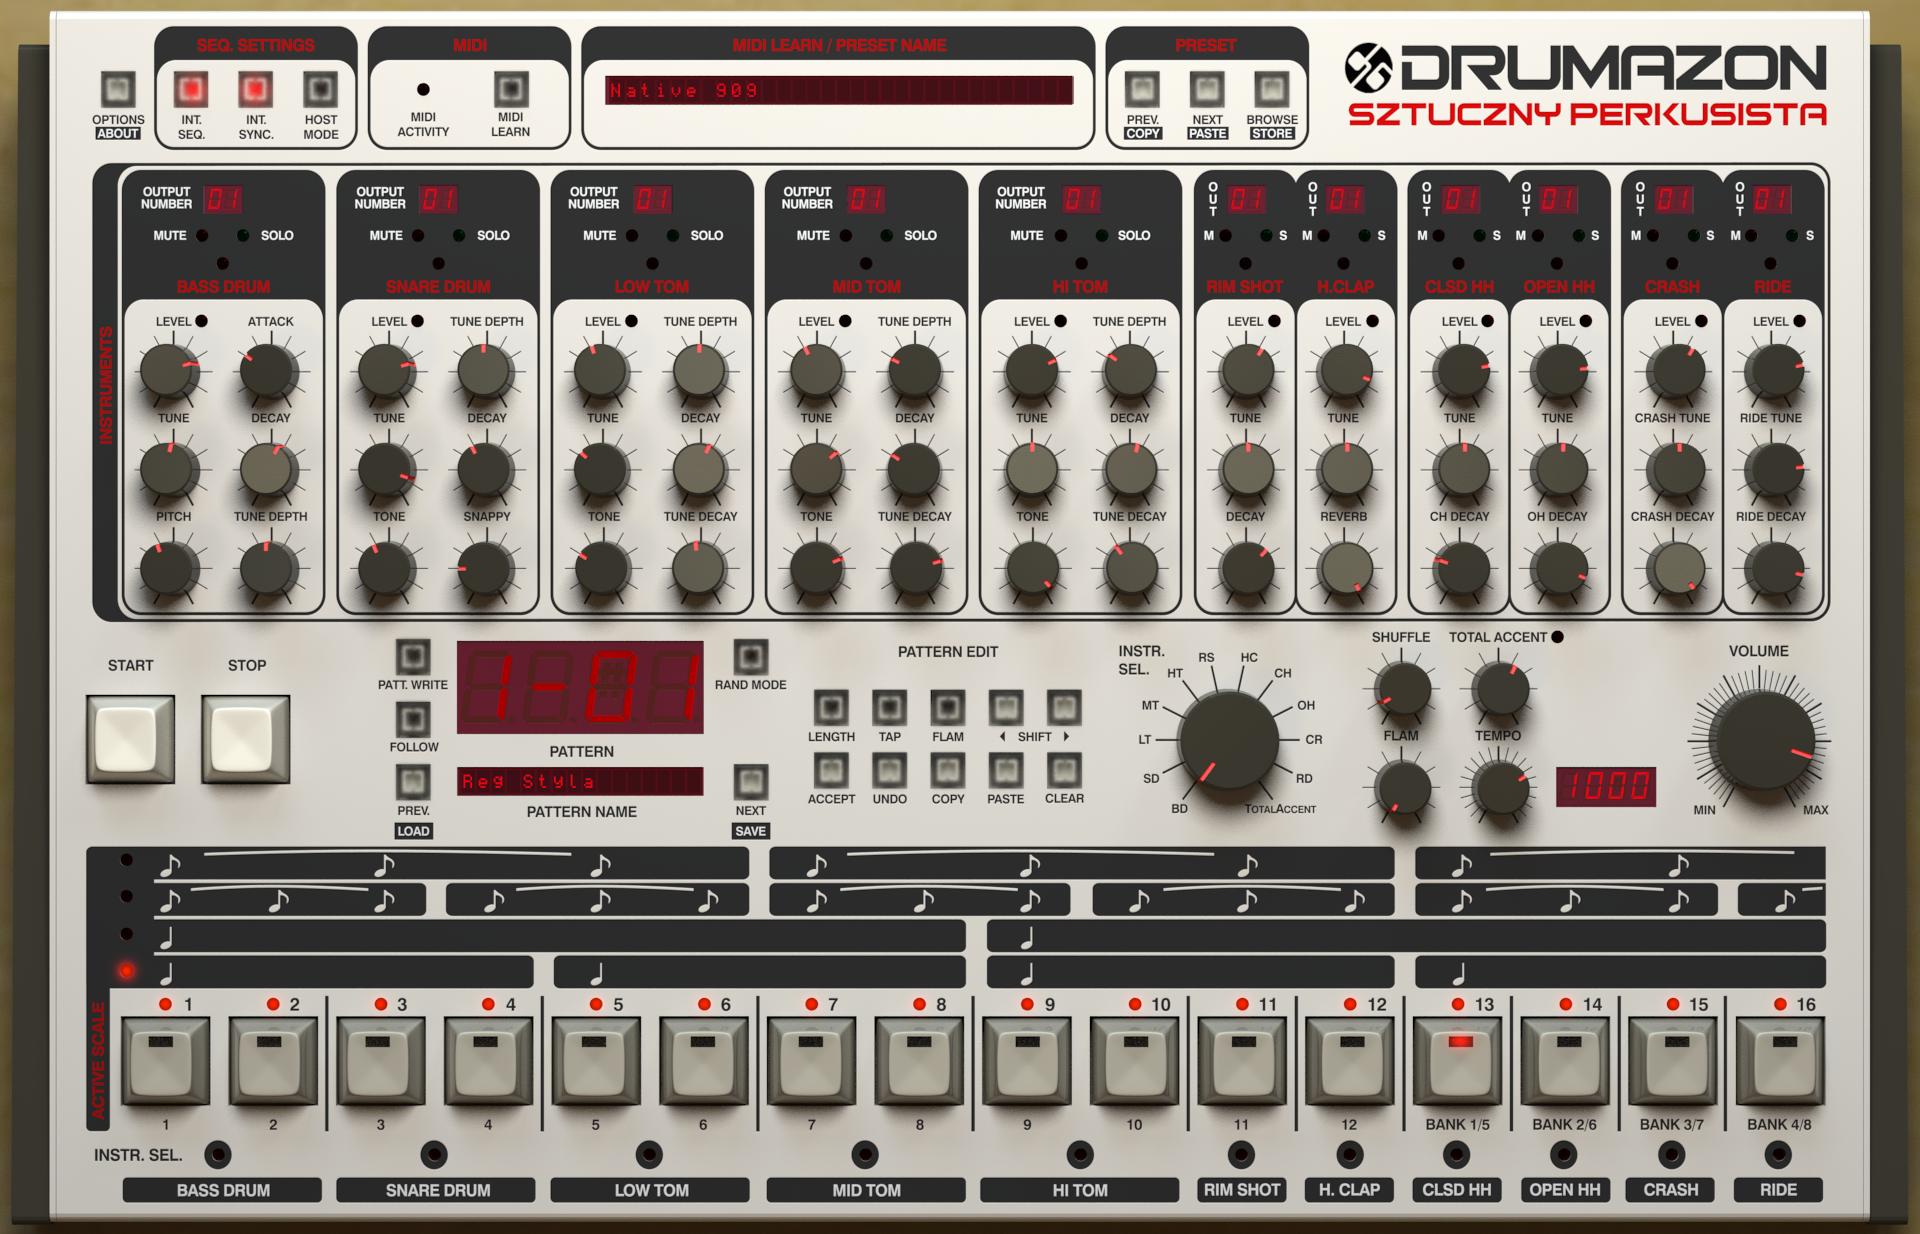 Drumazon full screenshot